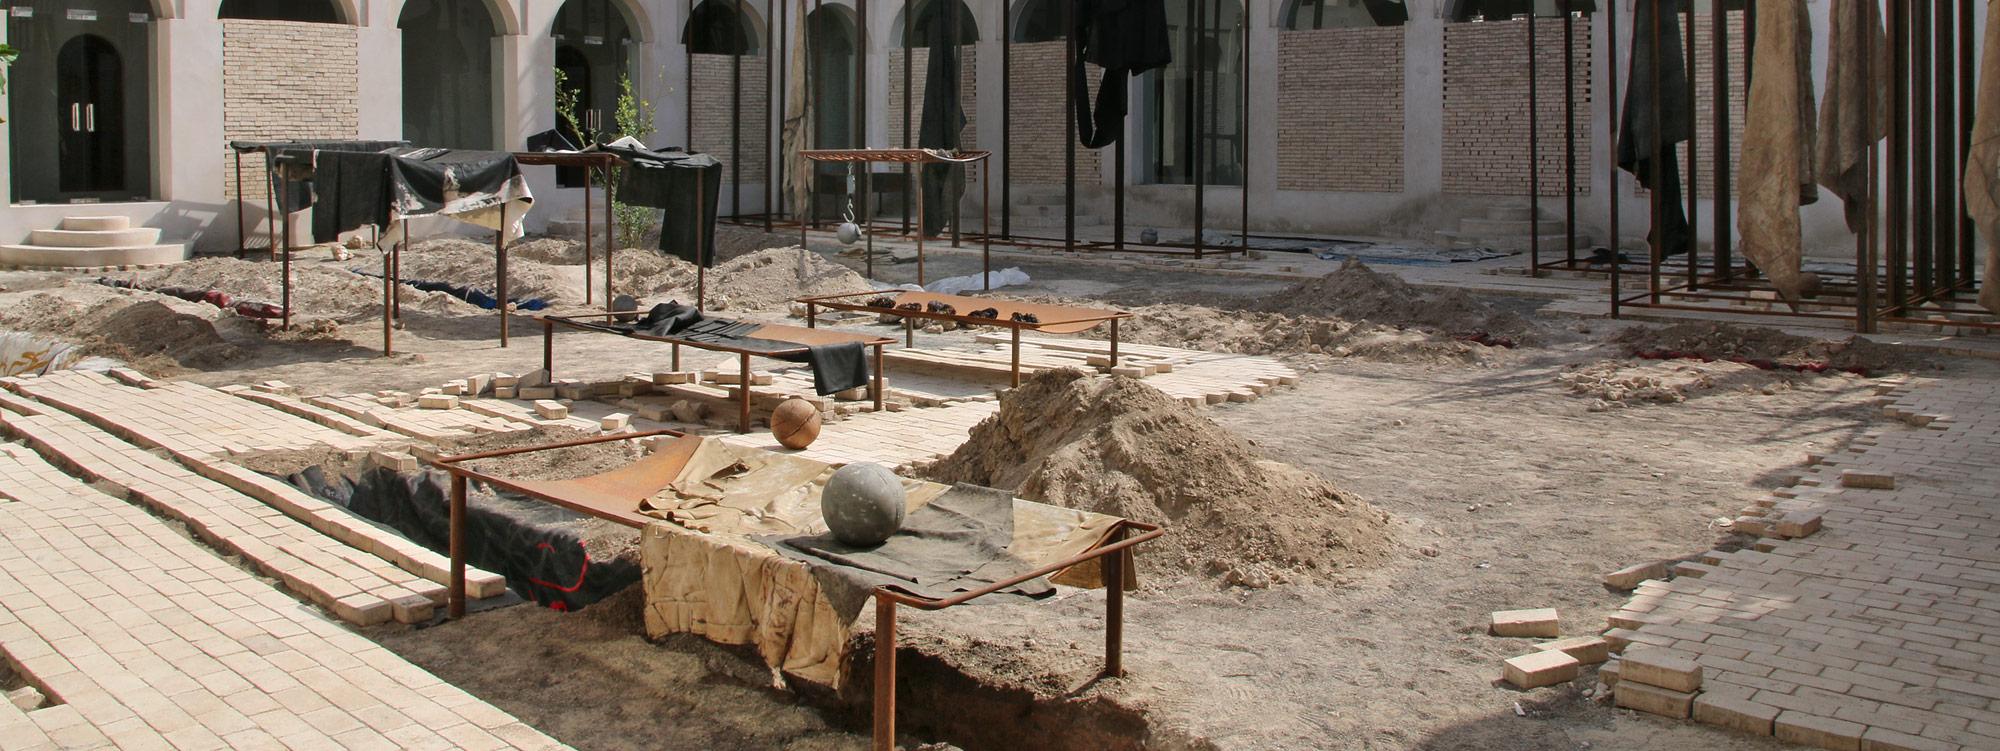 SB13 Act 1 in Sharjah: Visuelle Tour